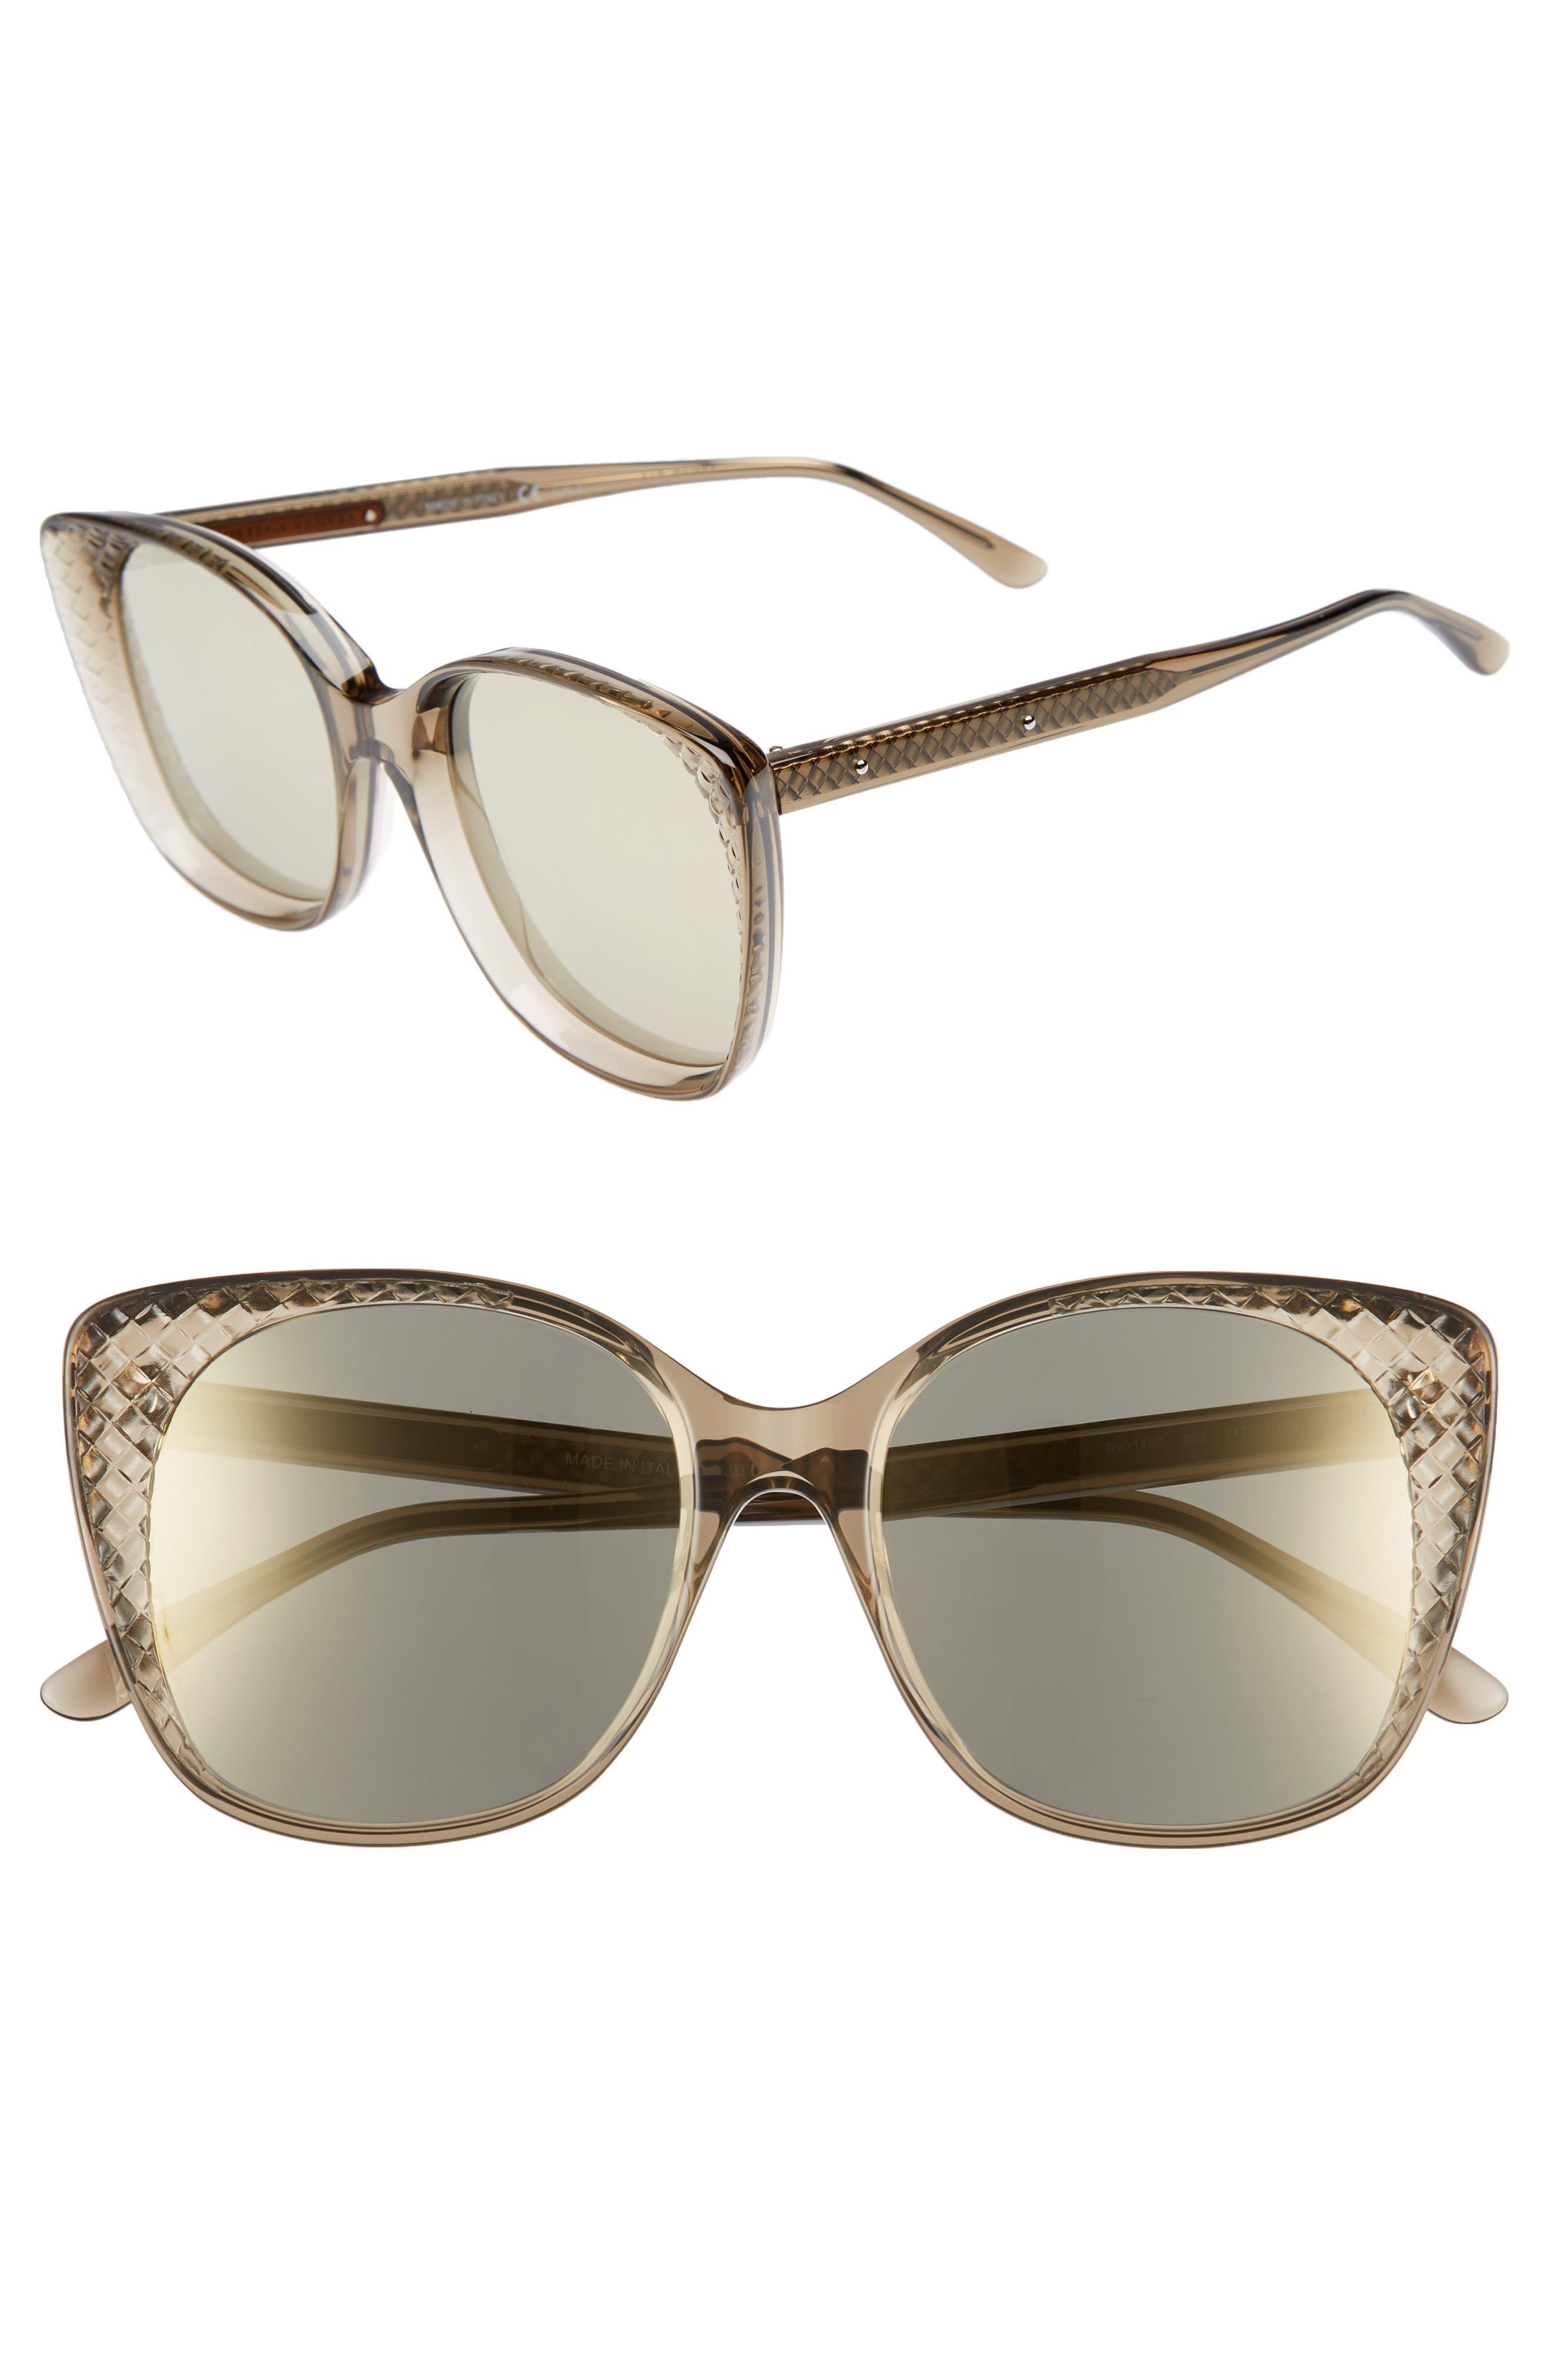 54mm Sunglasses,                             Main thumbnail 1, color,                             BROWN